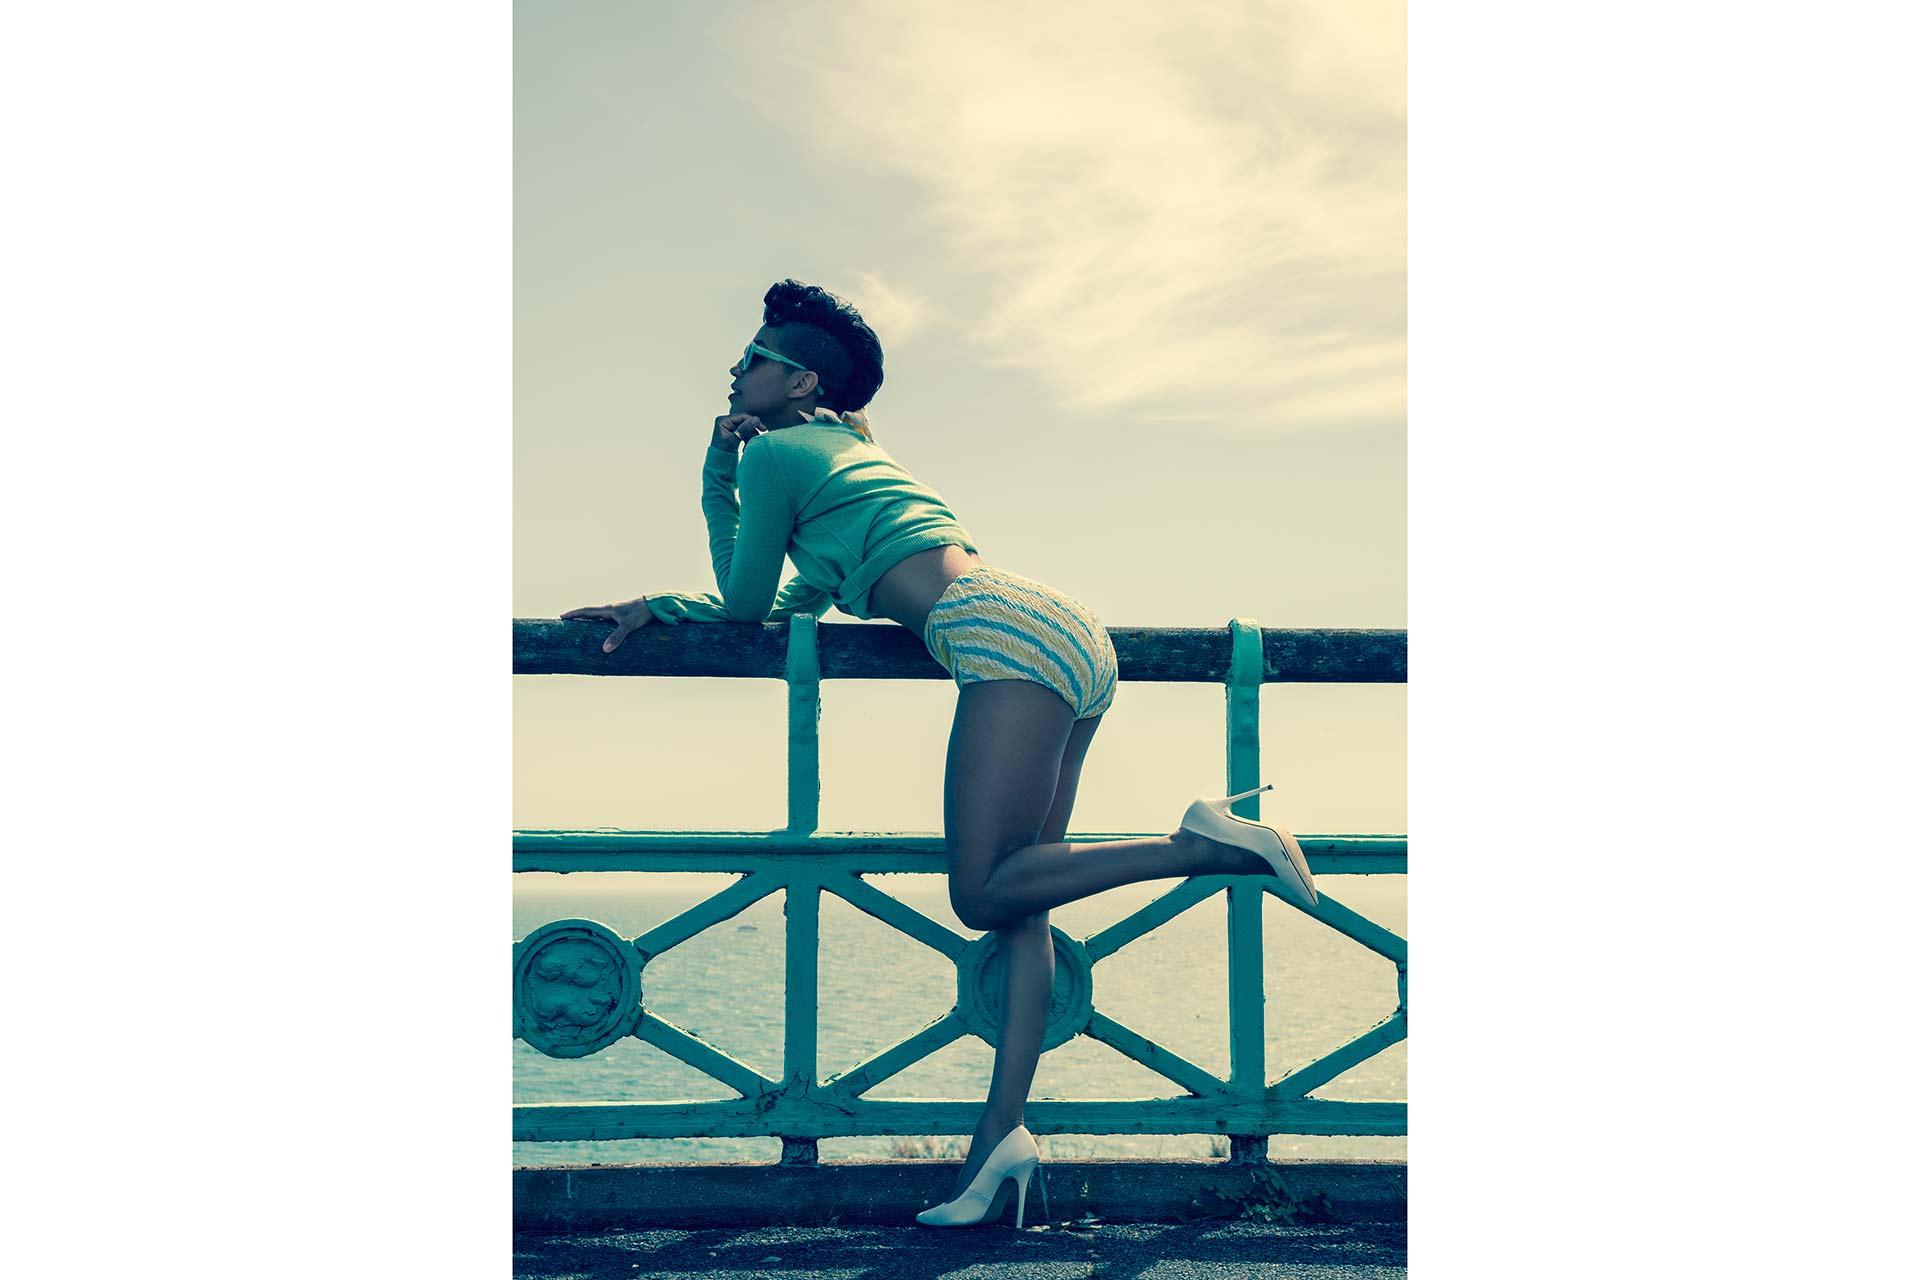 DOMINIQUE TIPPER HEY GIRL MAGAZINE ACTRESS